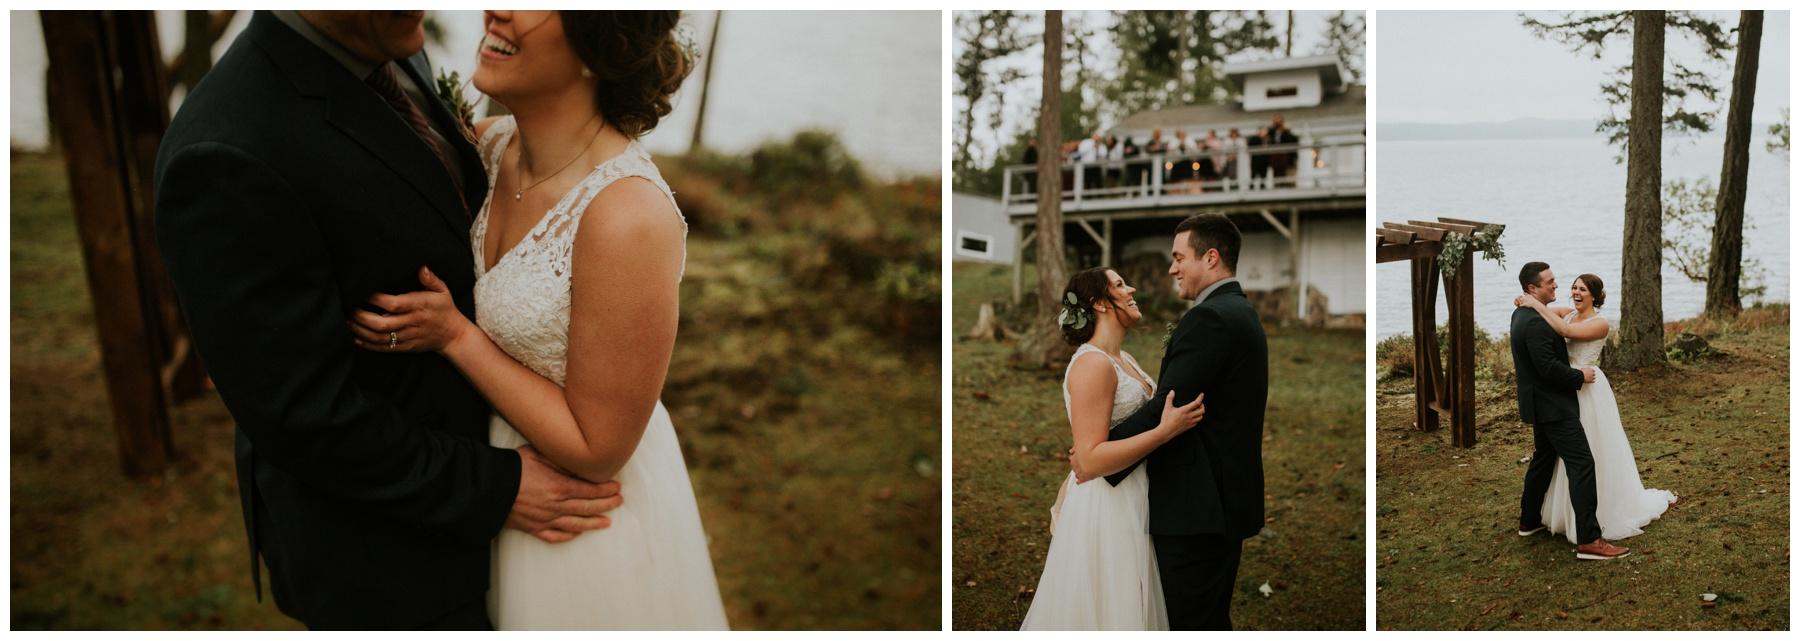 Friday Harbor waterfront wedding_0014.jpg